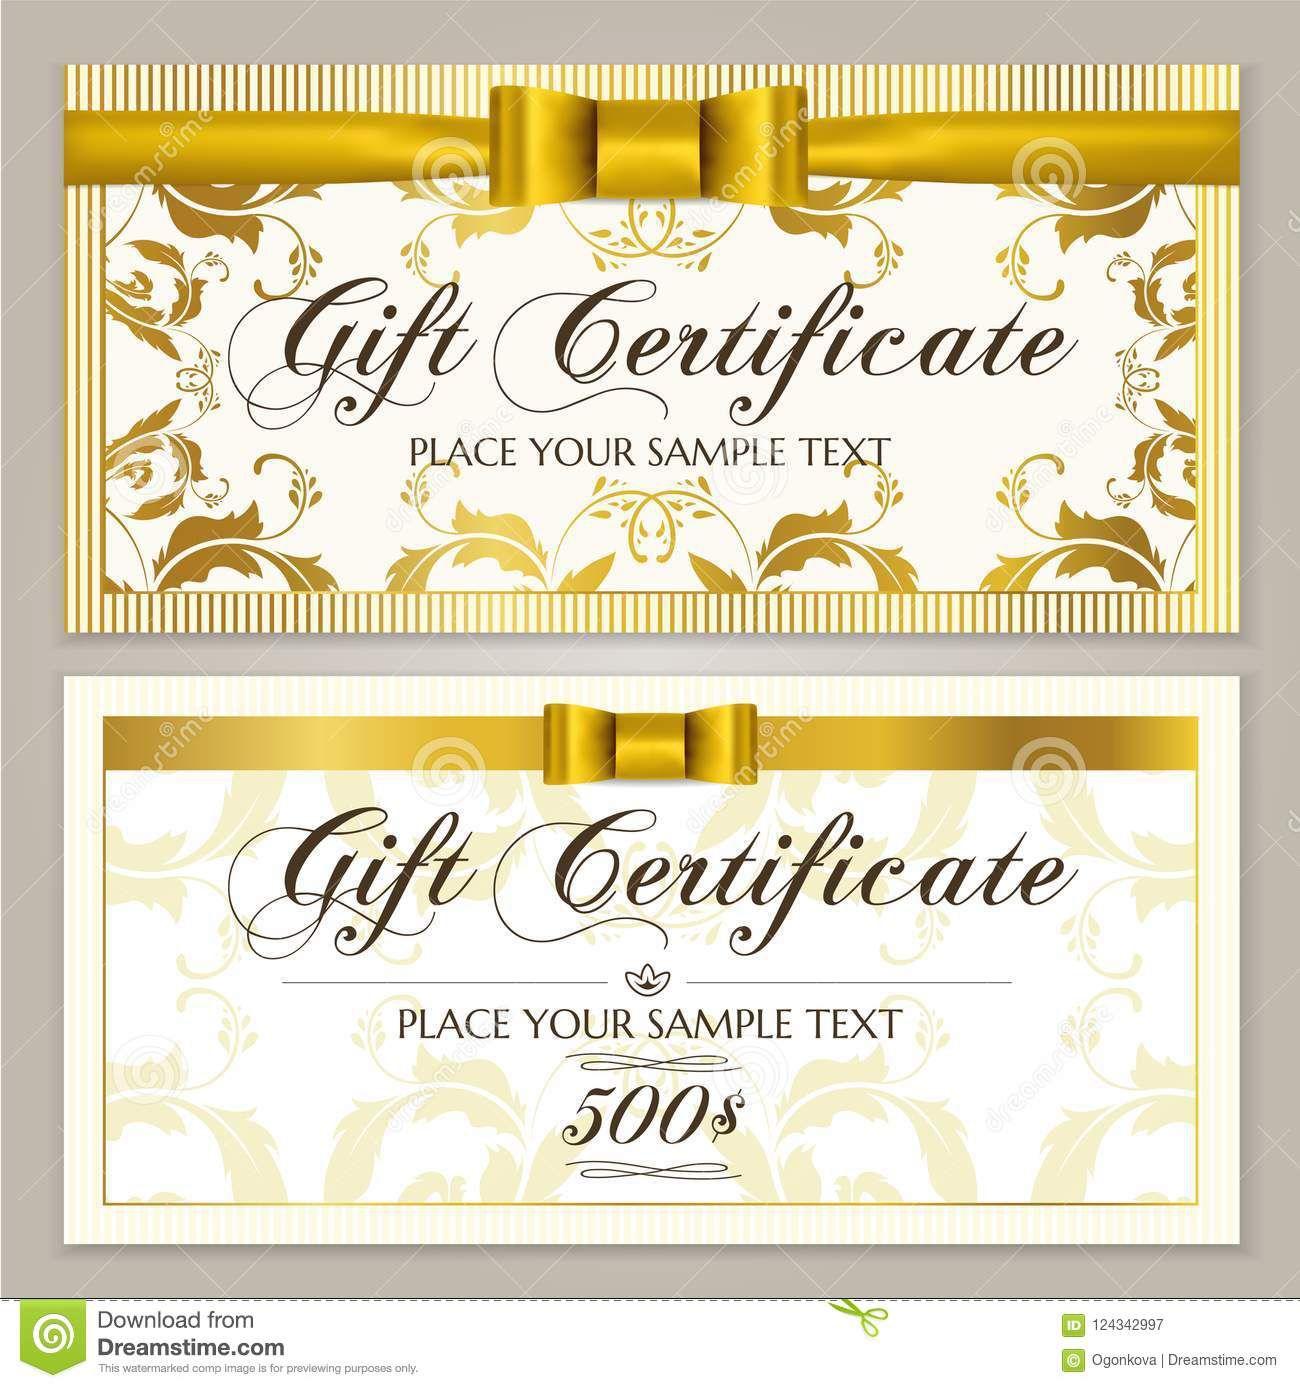 010 Surprising Restaurant Gift Certificate Template High Resolution  Templates Card Word Voucher FreeFull